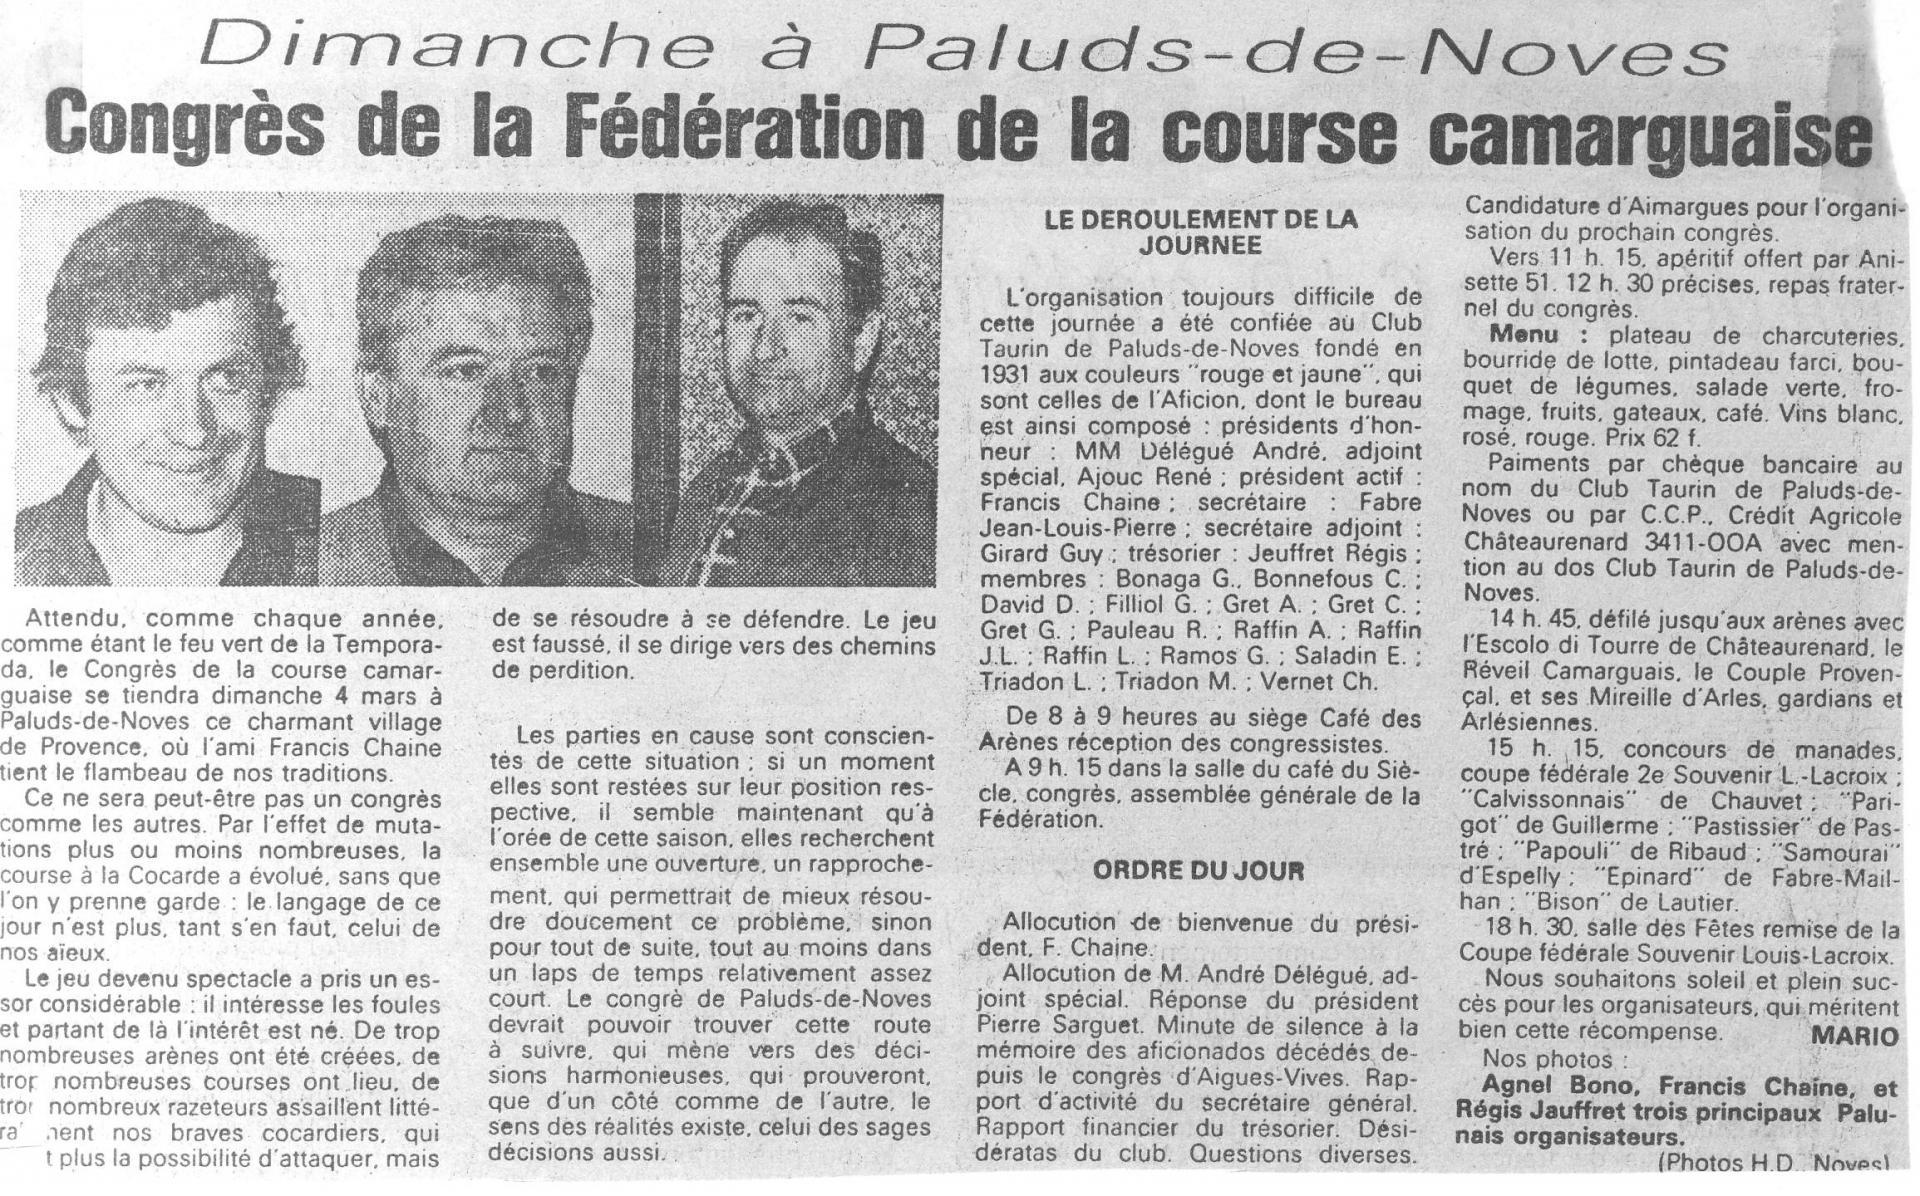 34 congres en 1979 art 3